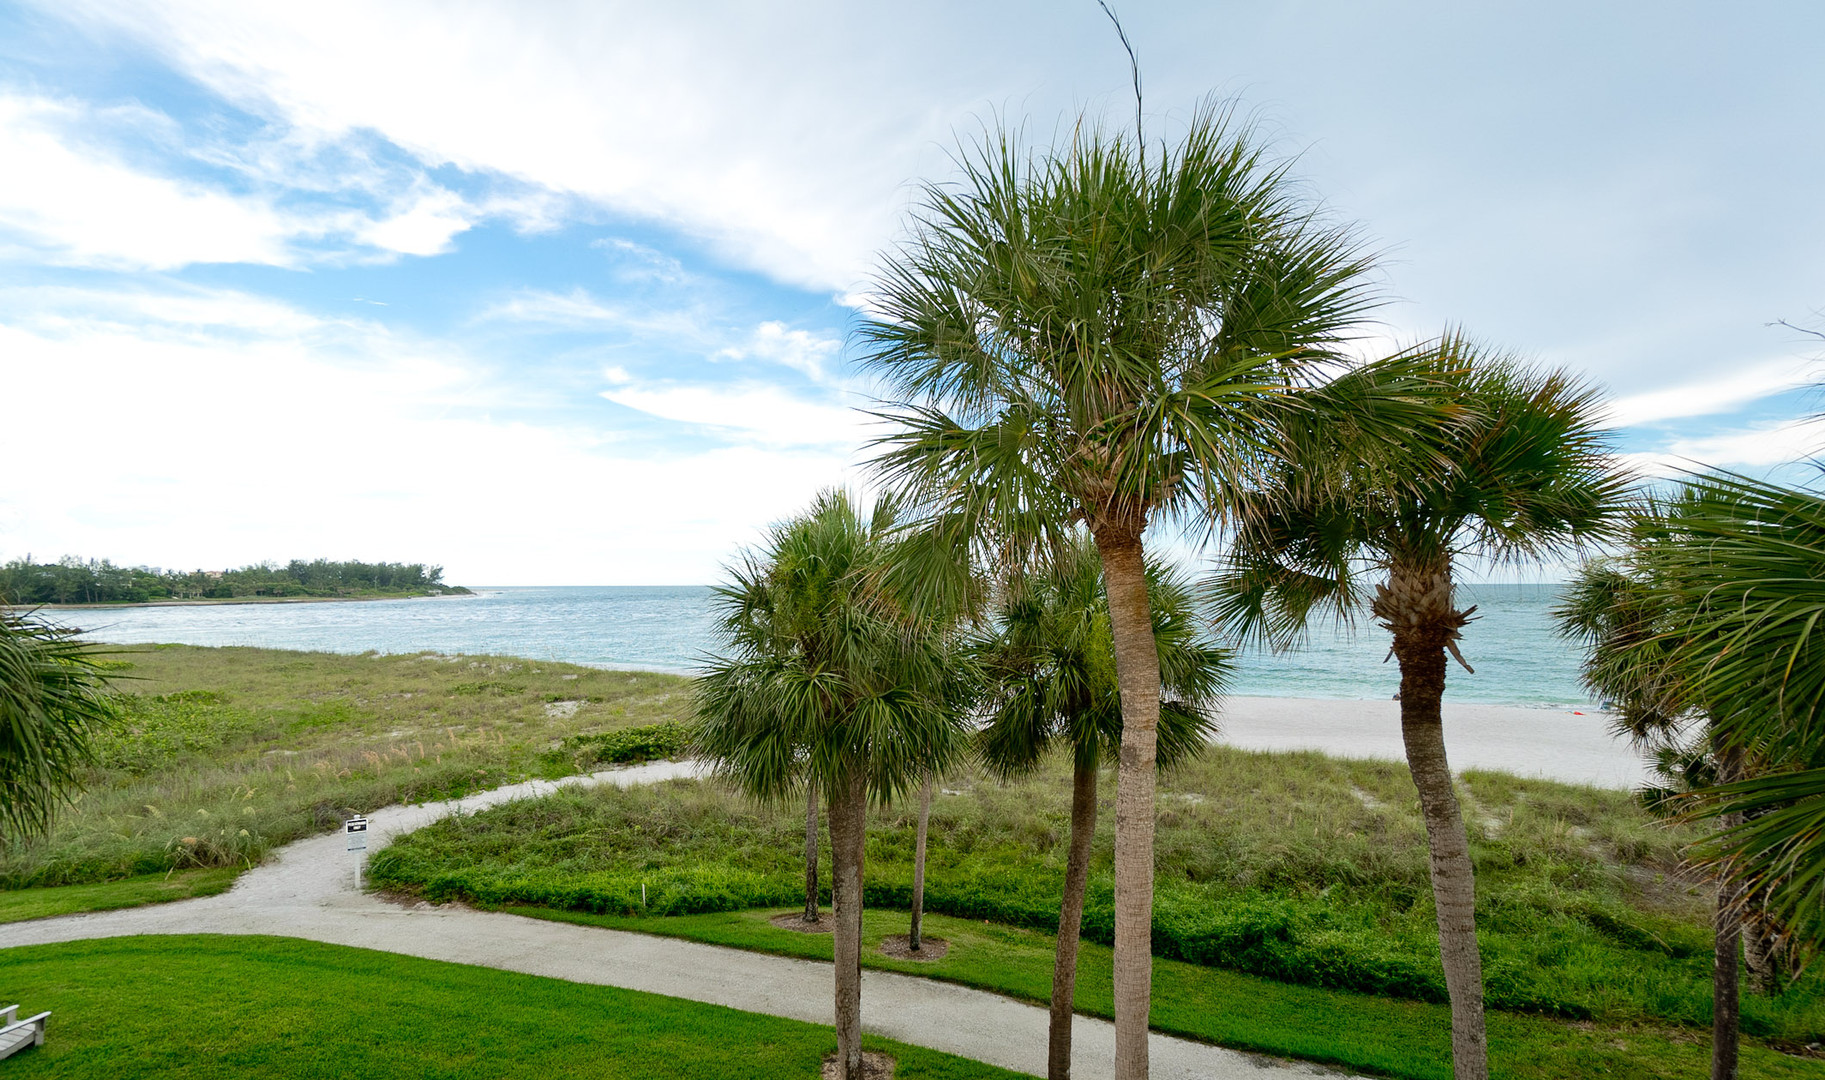 Majestic palms overlooking the Gulf